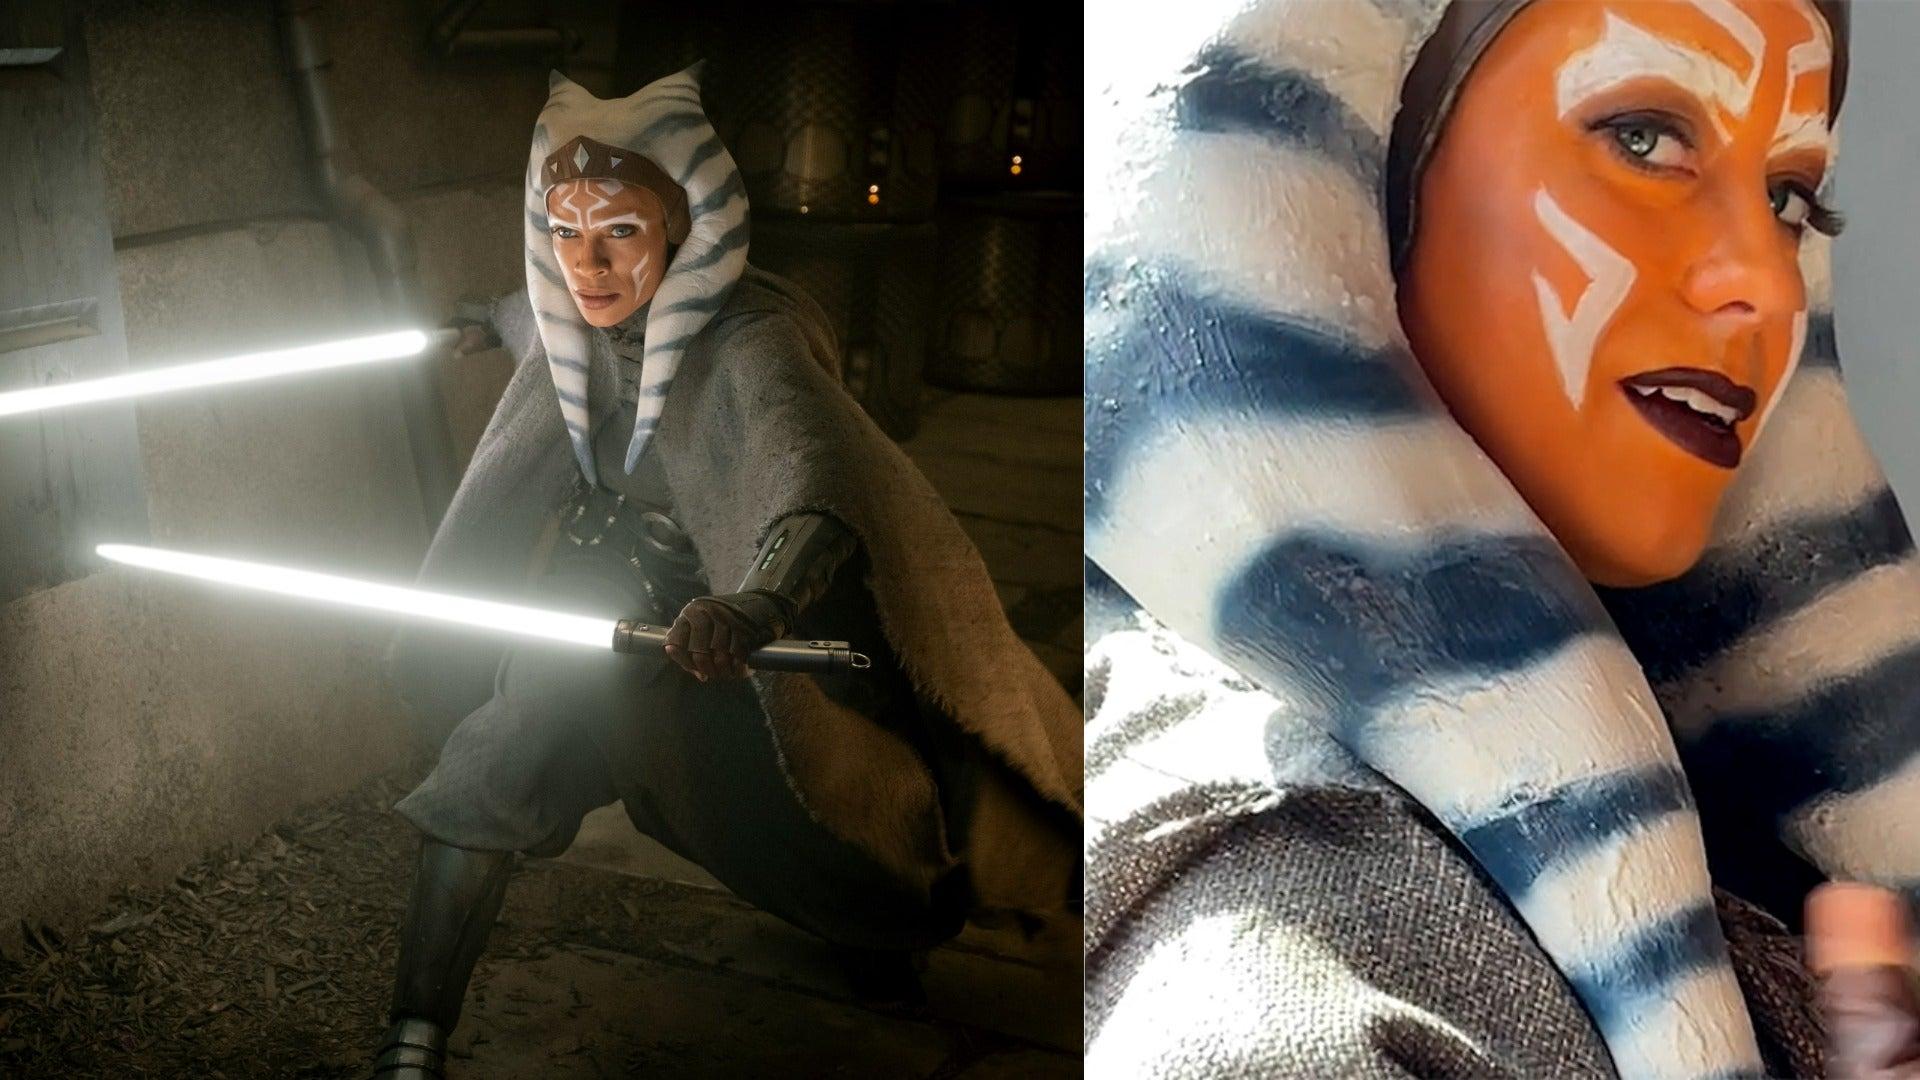 Jedimanda as Star Wars character Ahsoka Tano